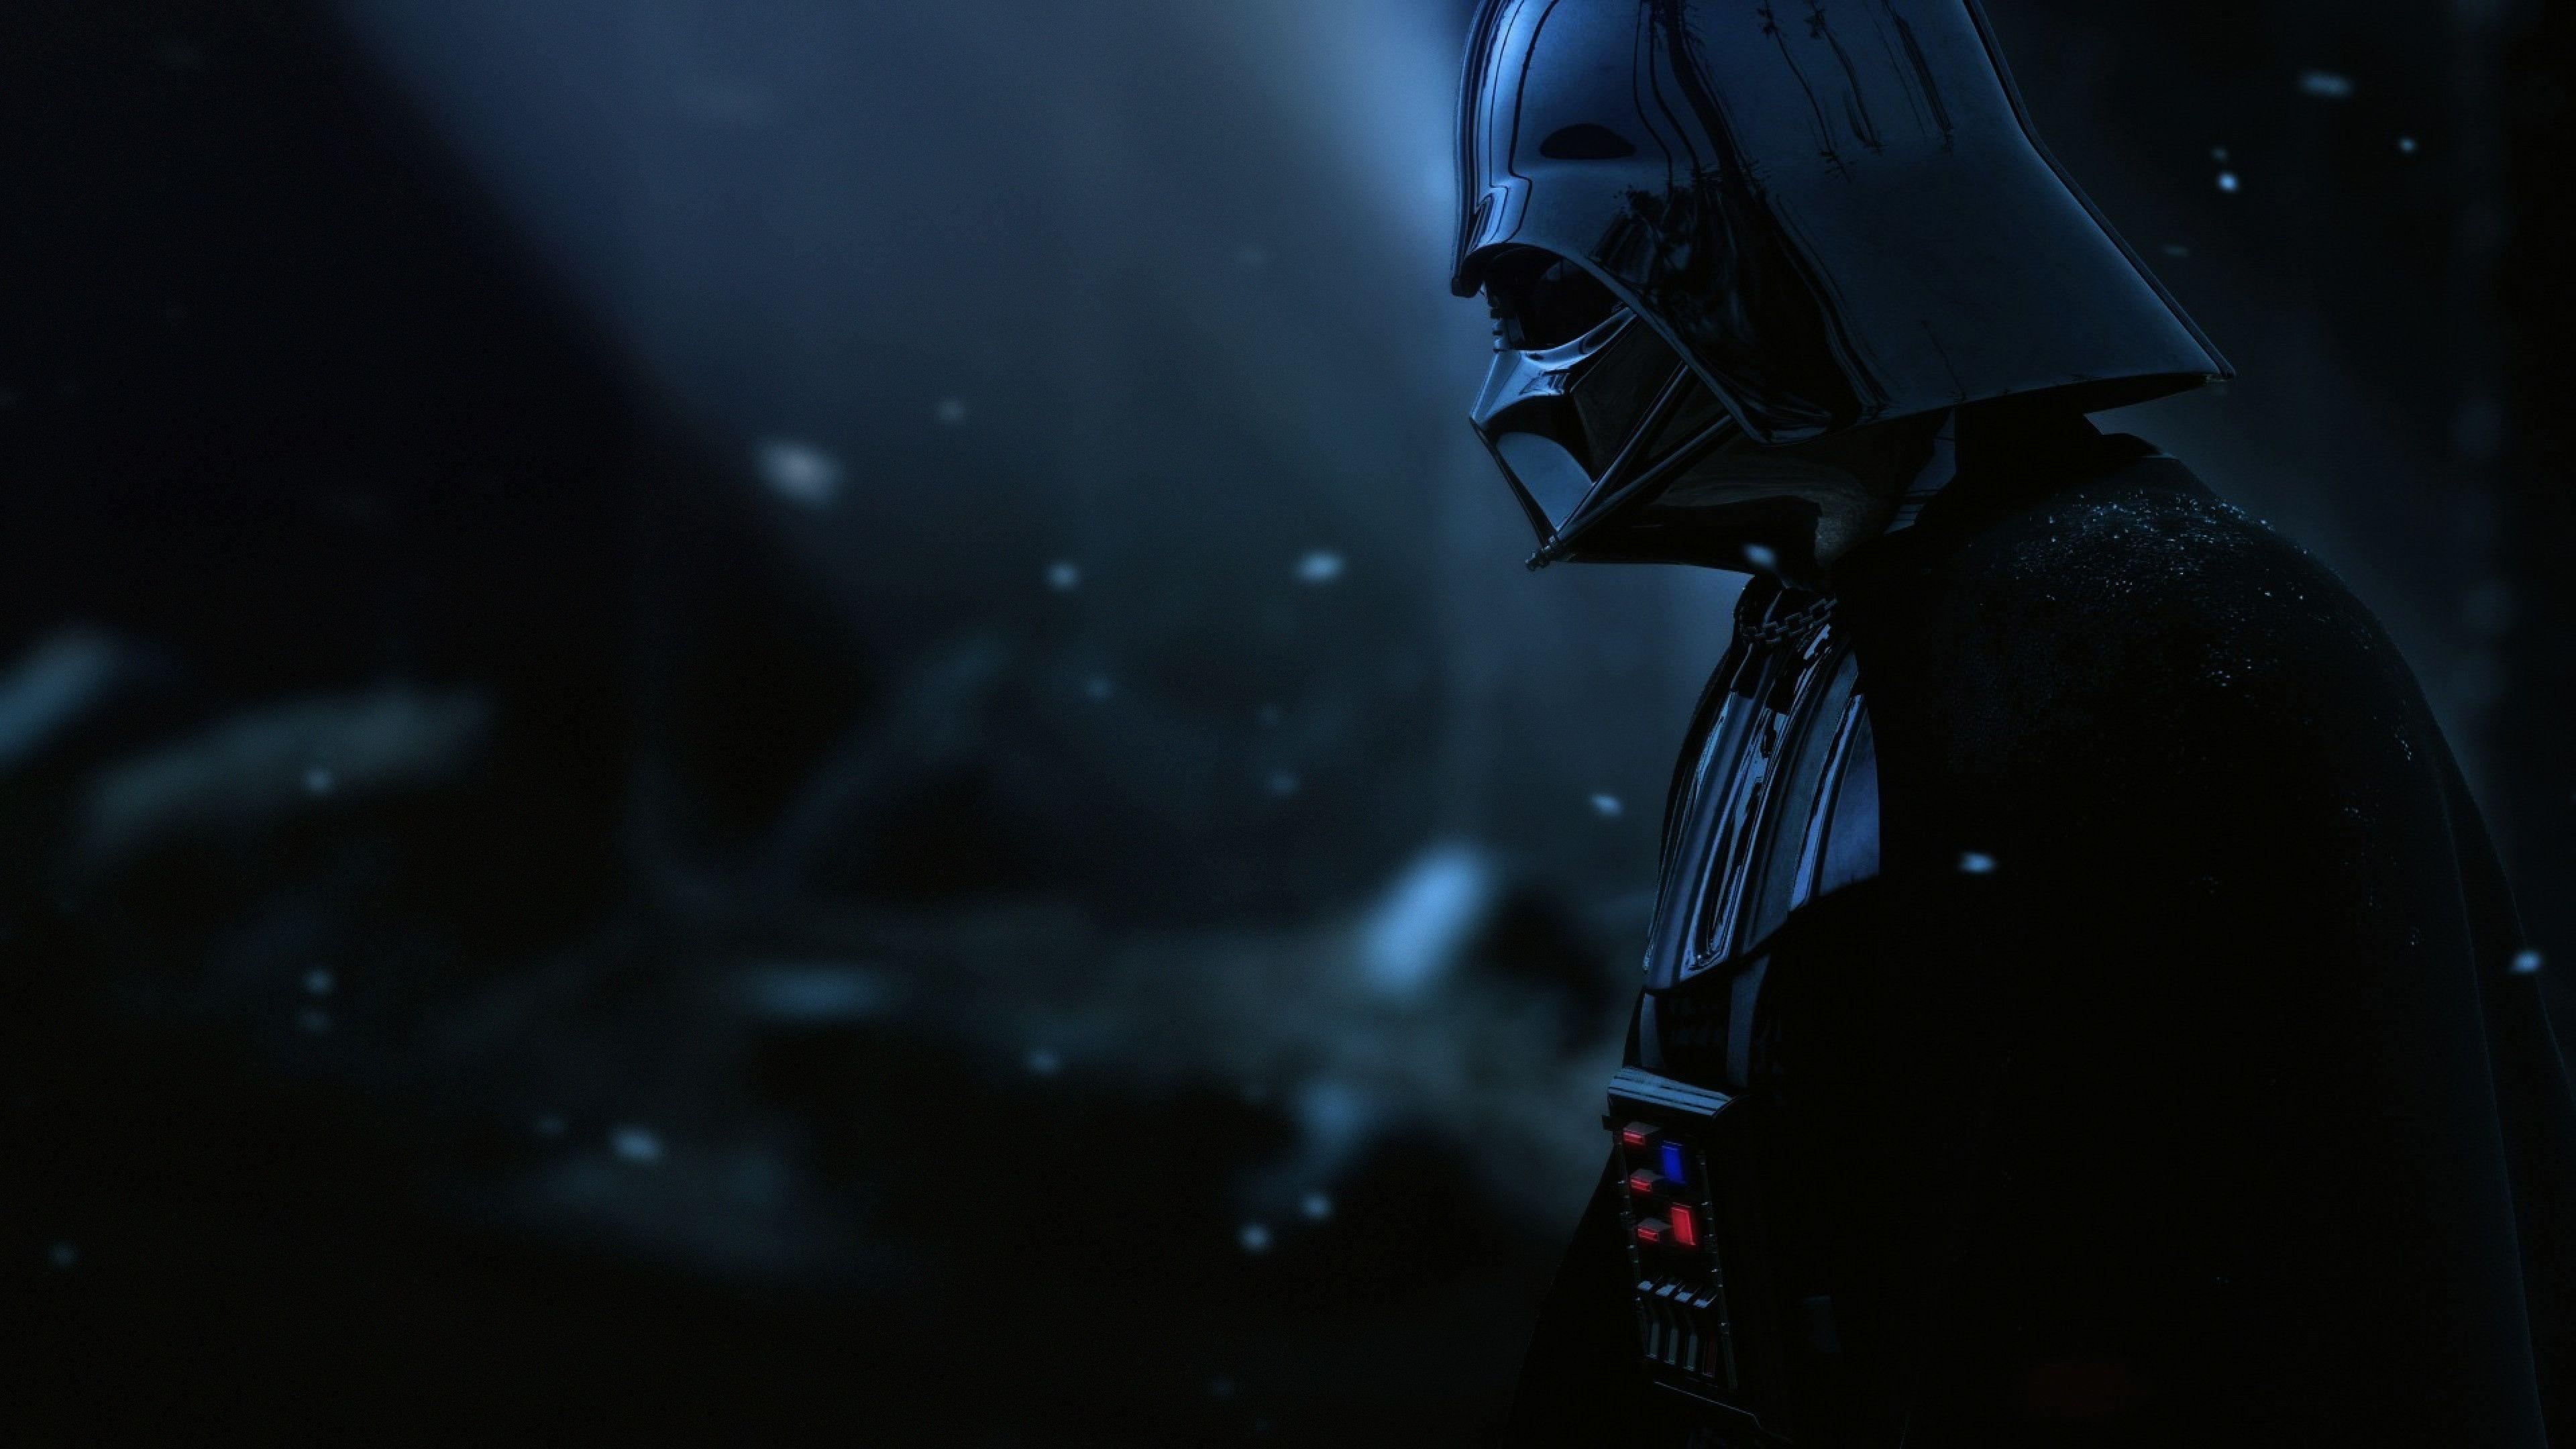 Star Wars Episode 3 Wallpaper 4k